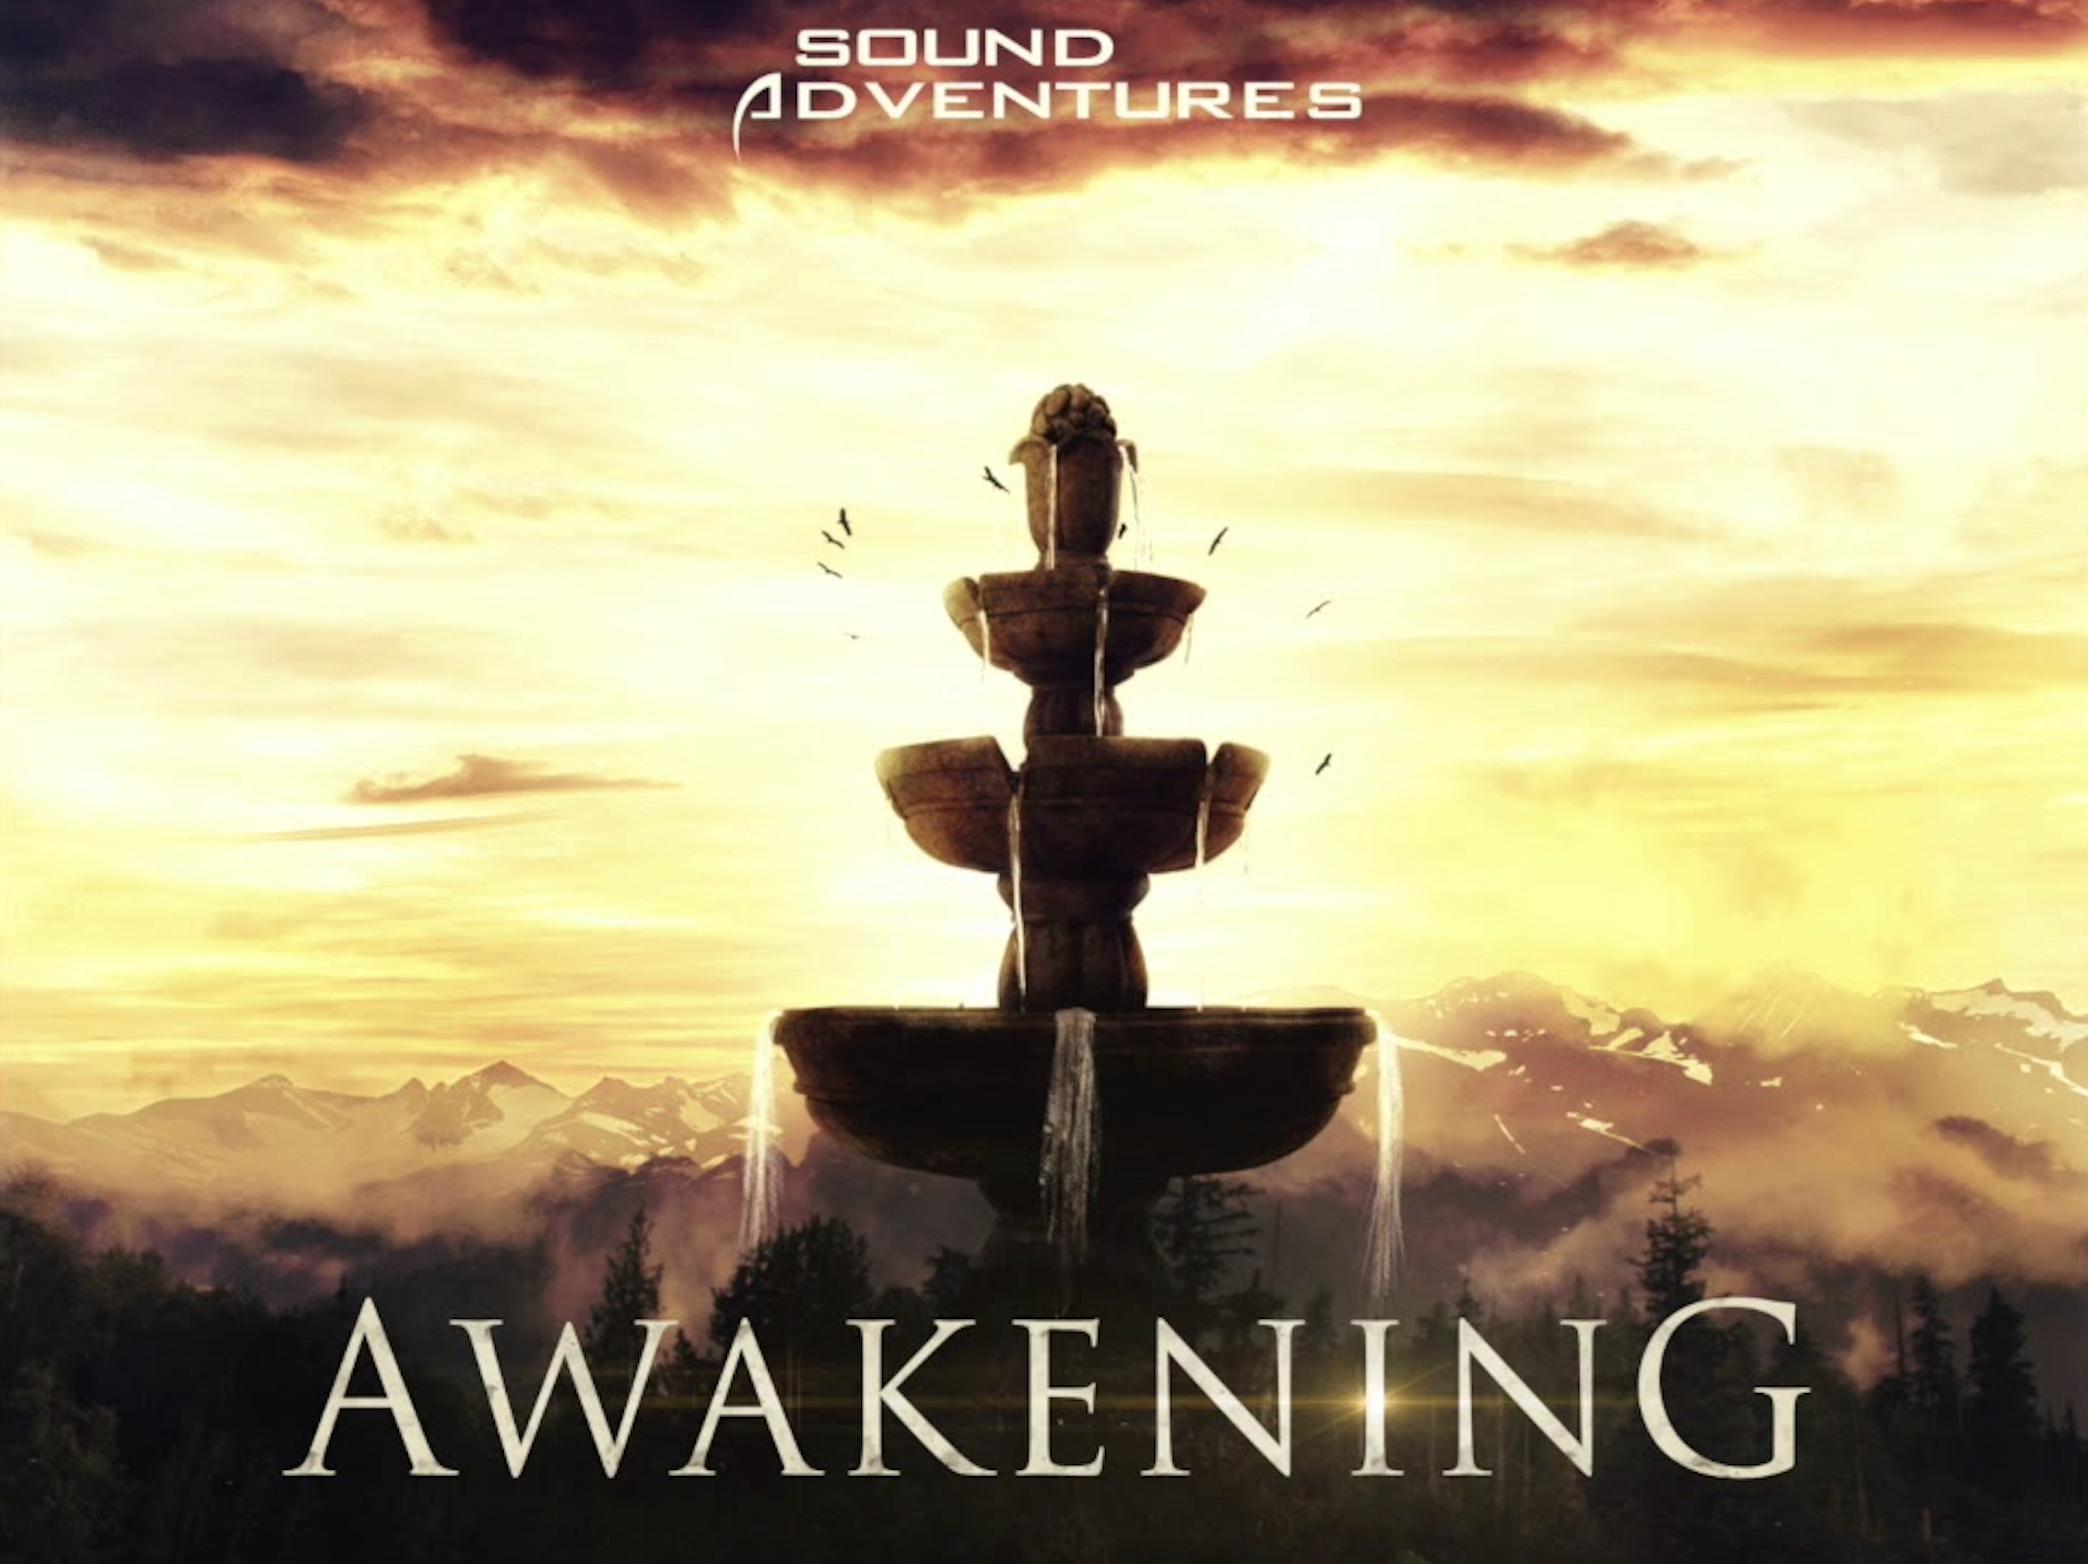 Awakening - published by Sound Adventures